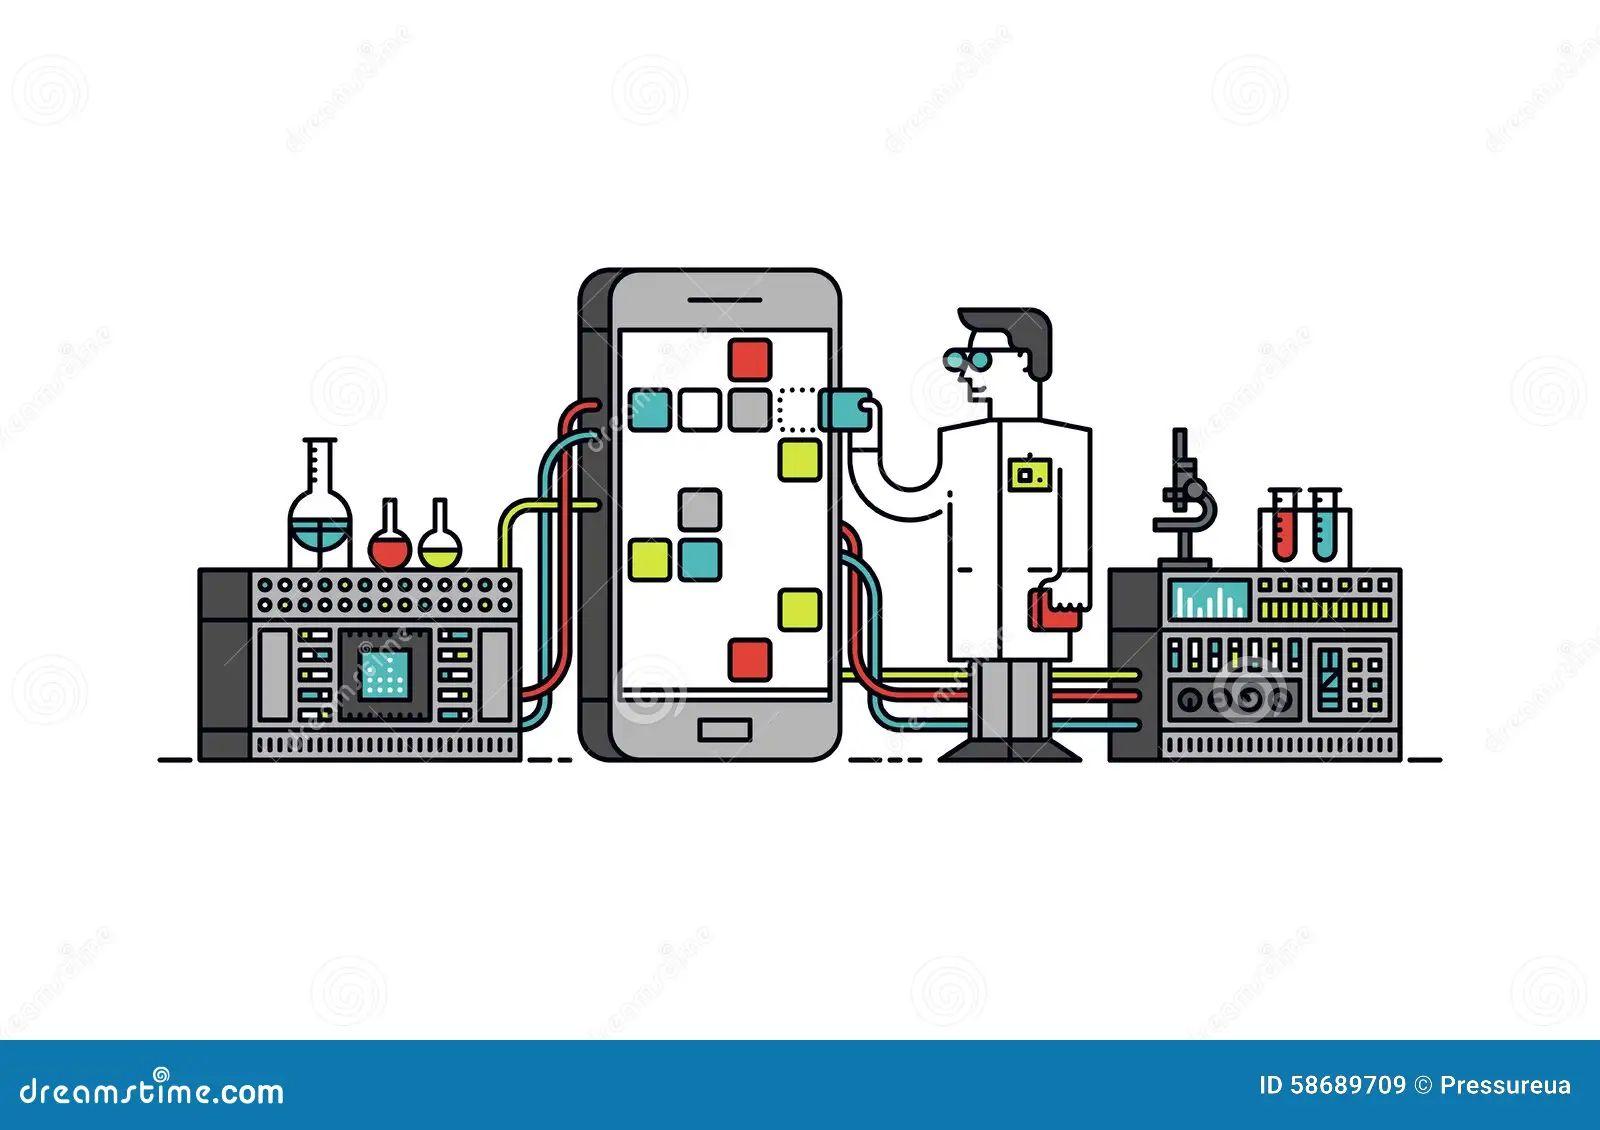 phone service diagram